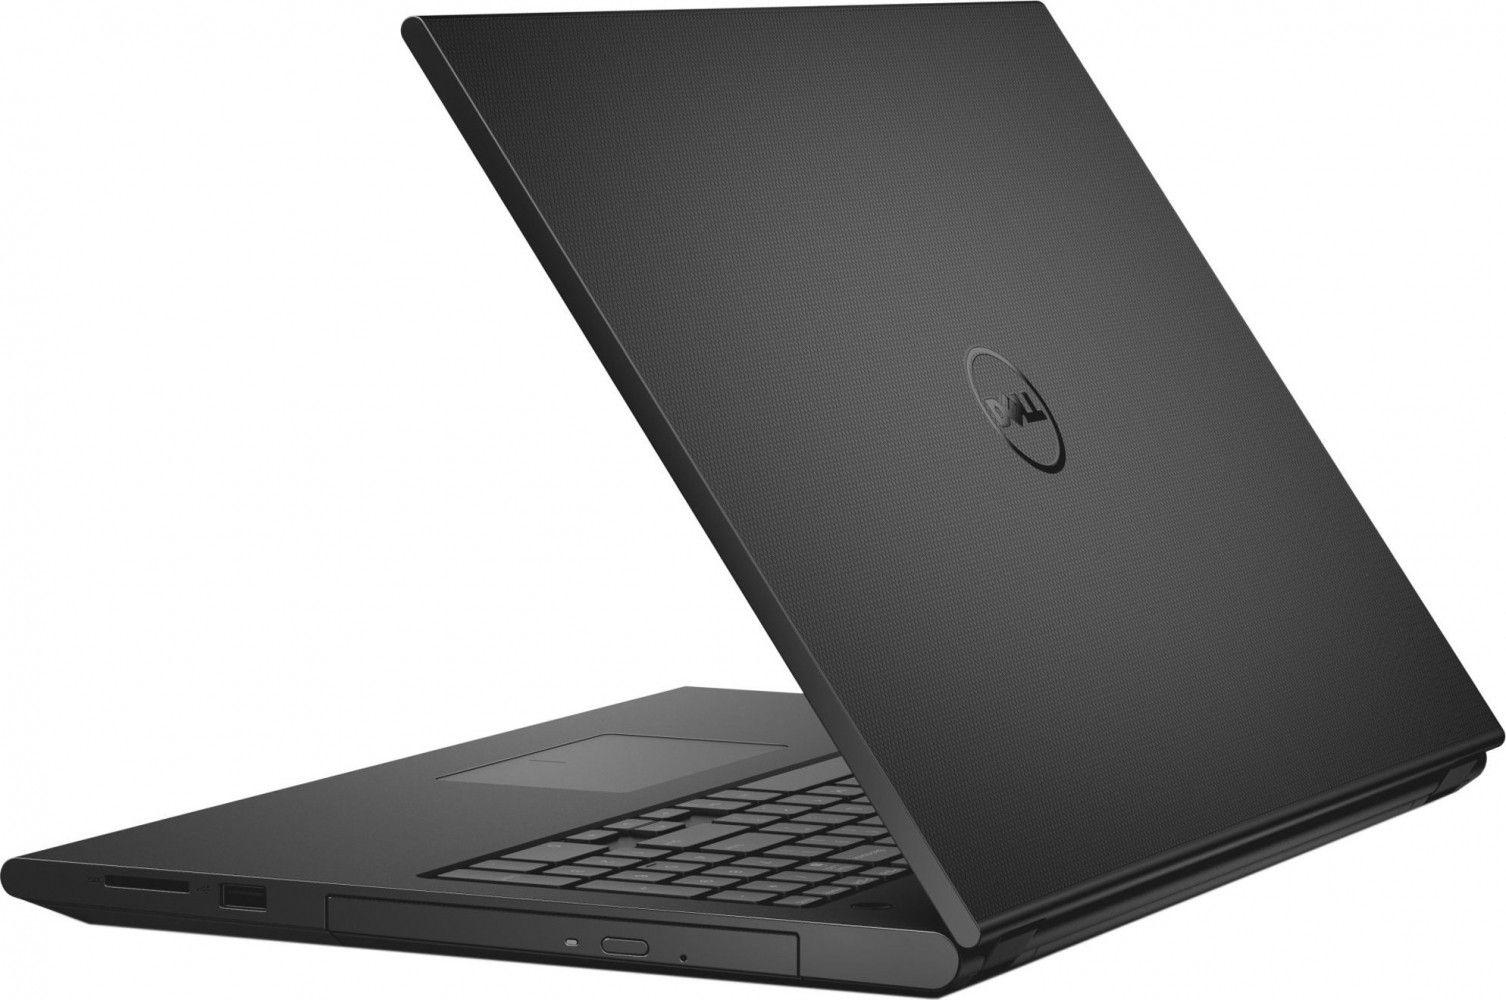 Ноутбук Dell Inspiron 3542 (I35345DDL-46) Black - 1